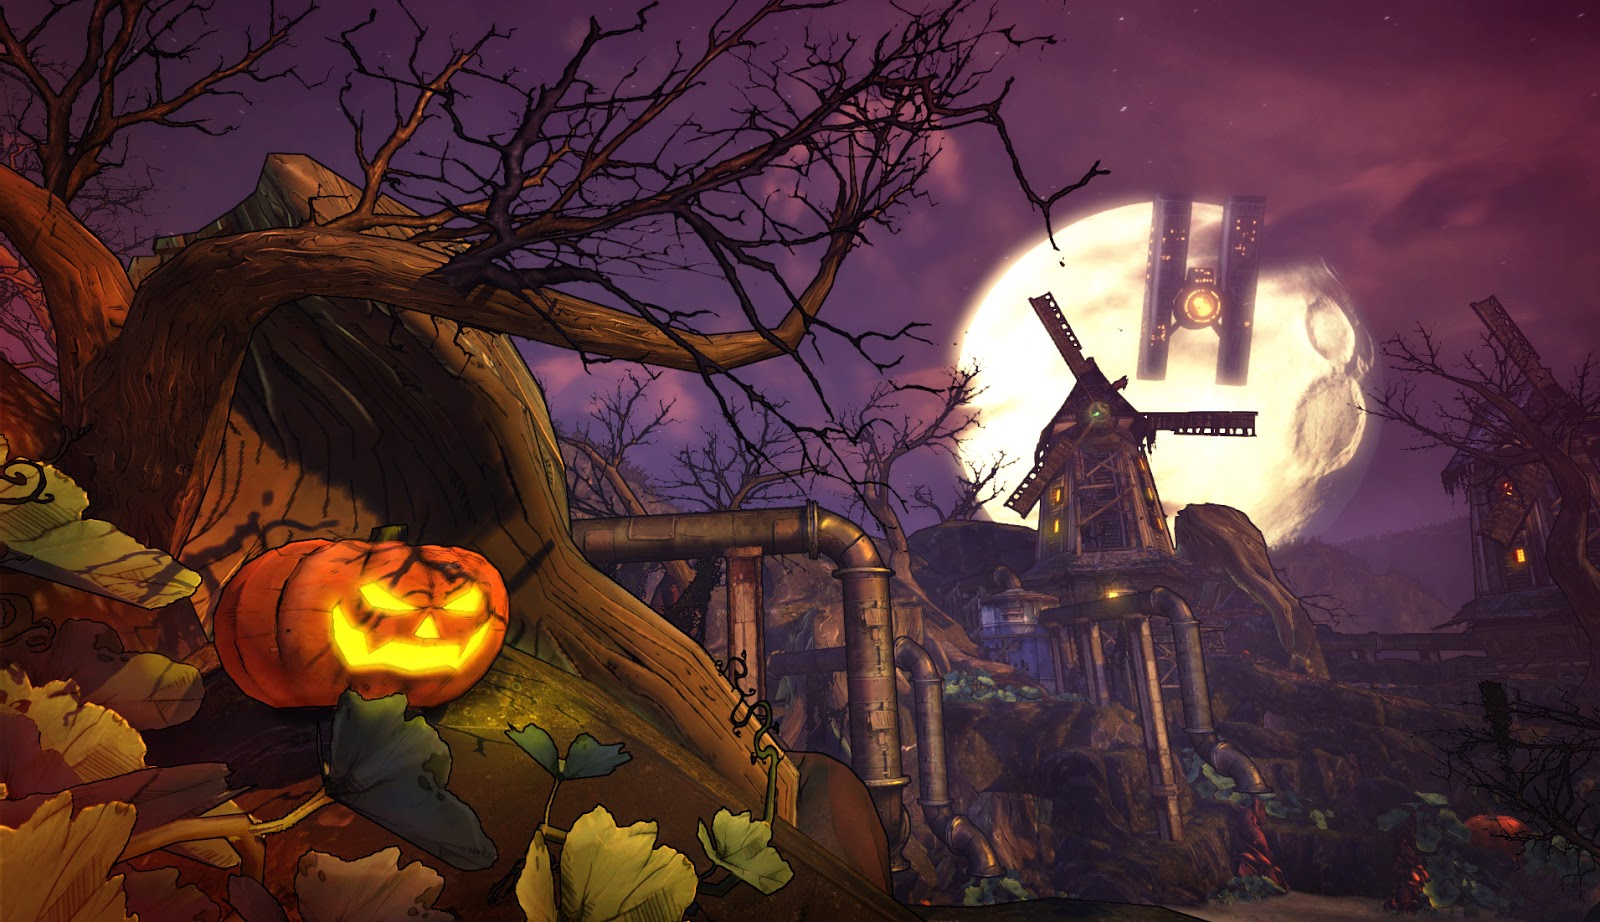 Especial de Halloween | 6 Games de Horror Desconhecidos ou Subestimados